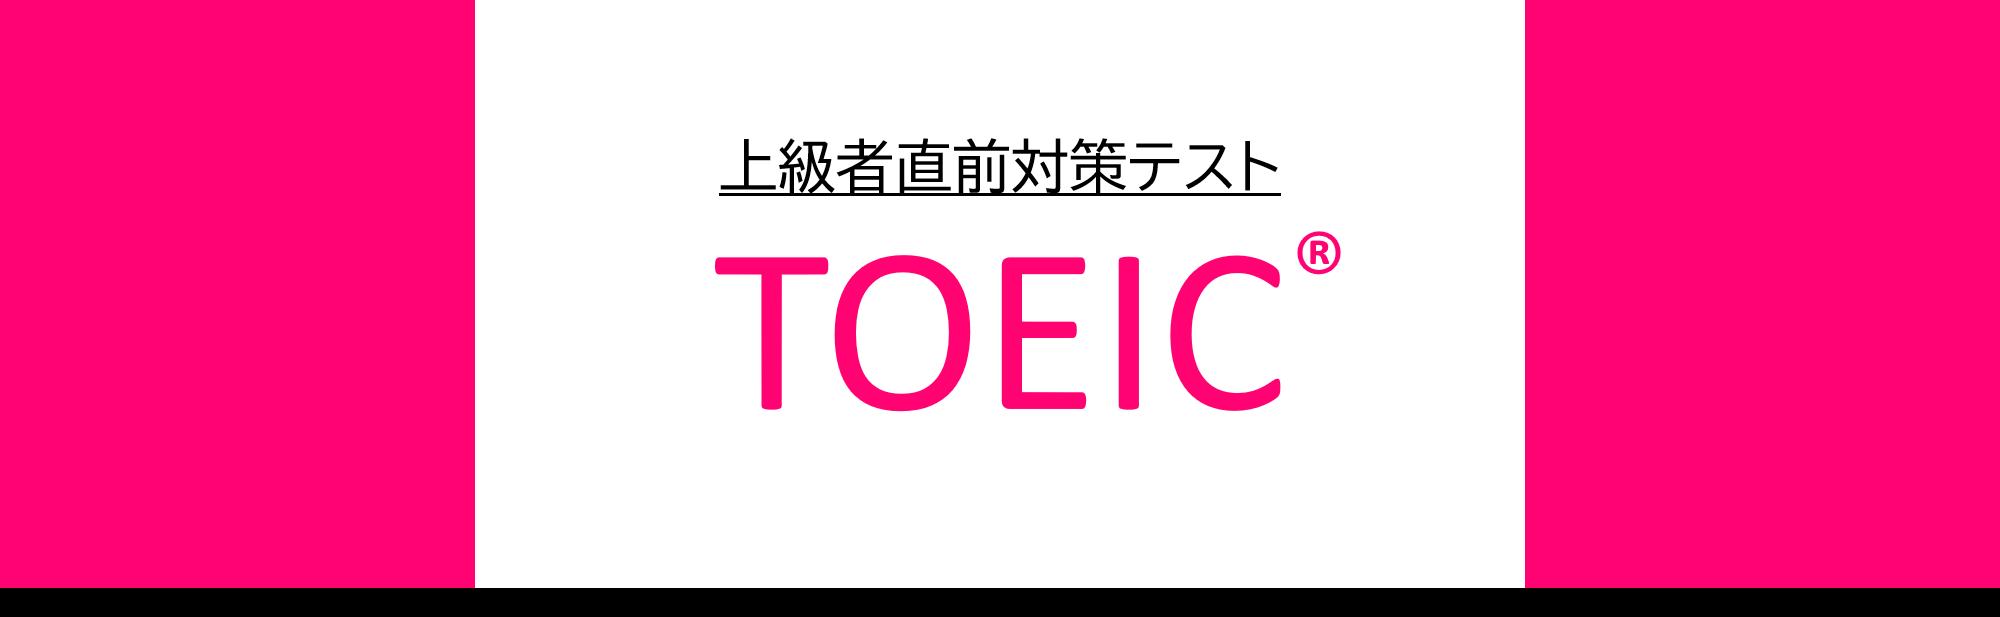 TOEIC®L&R TEST 上級者 直前対策テスト(730点以上)